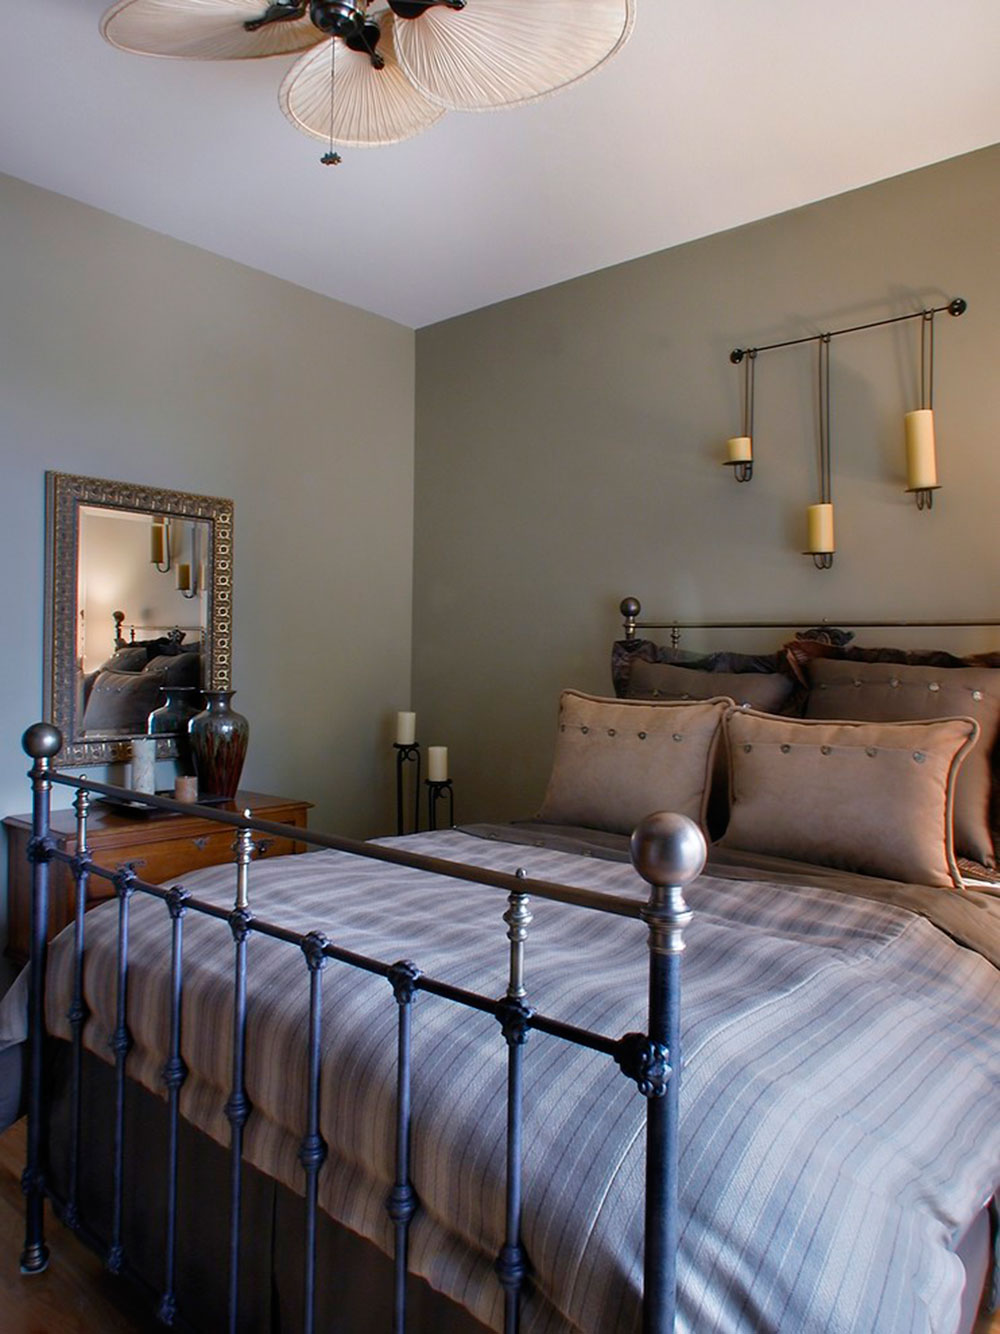 Vintage-pad-by-Van-H-Robinson vintage sovrumsidéer som inte bör förbises